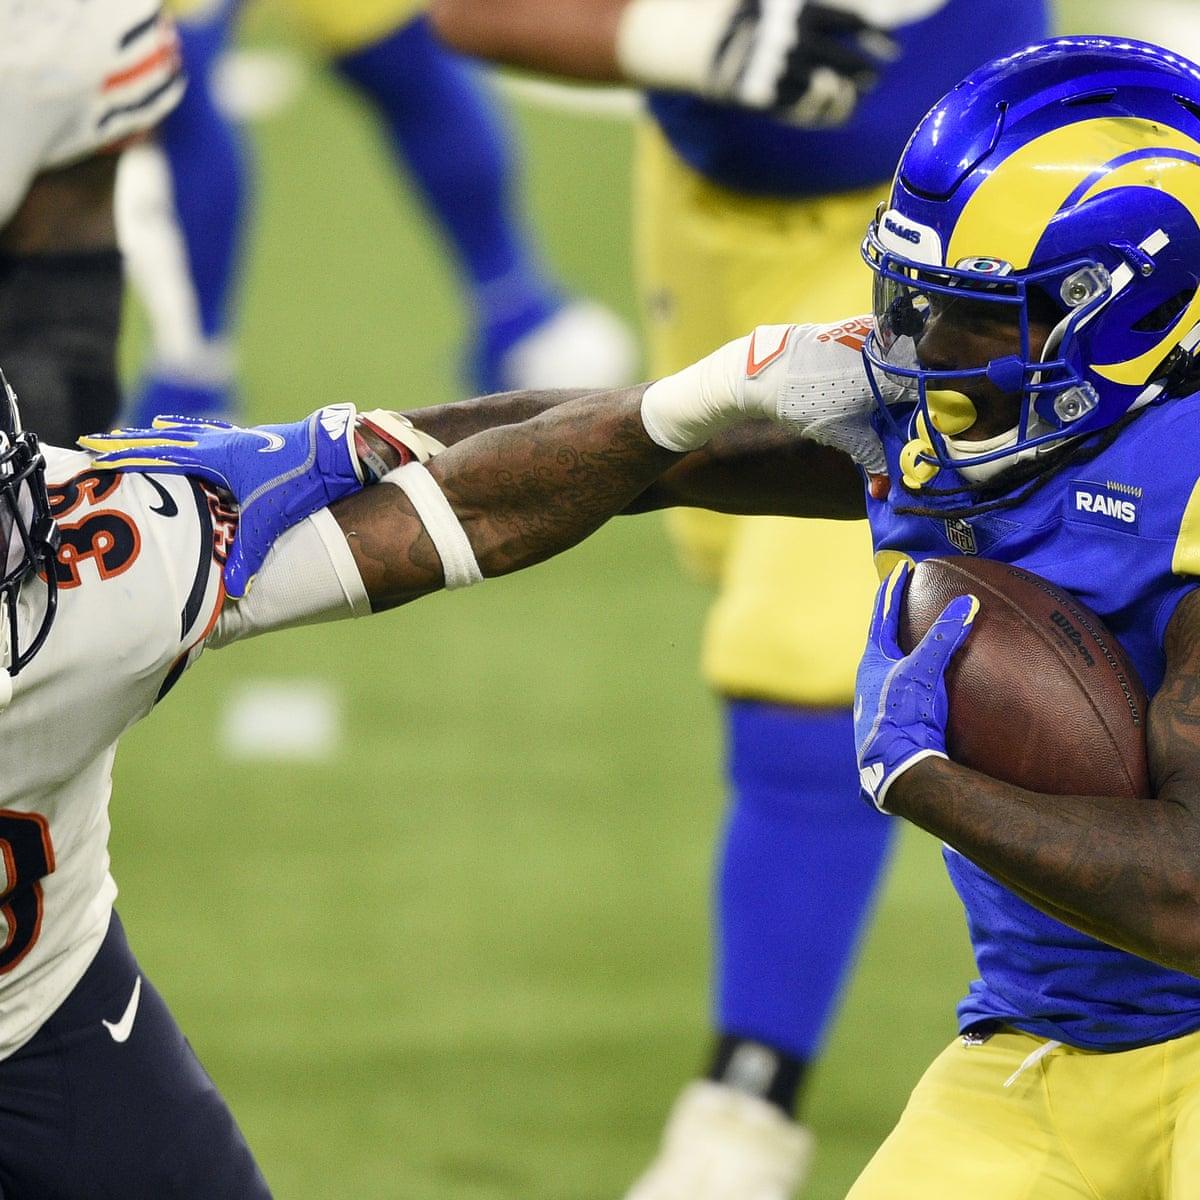 La Rams Dominate Chicago Bears In Rivals Latest Defensive Slugfest Nfl The Guardian